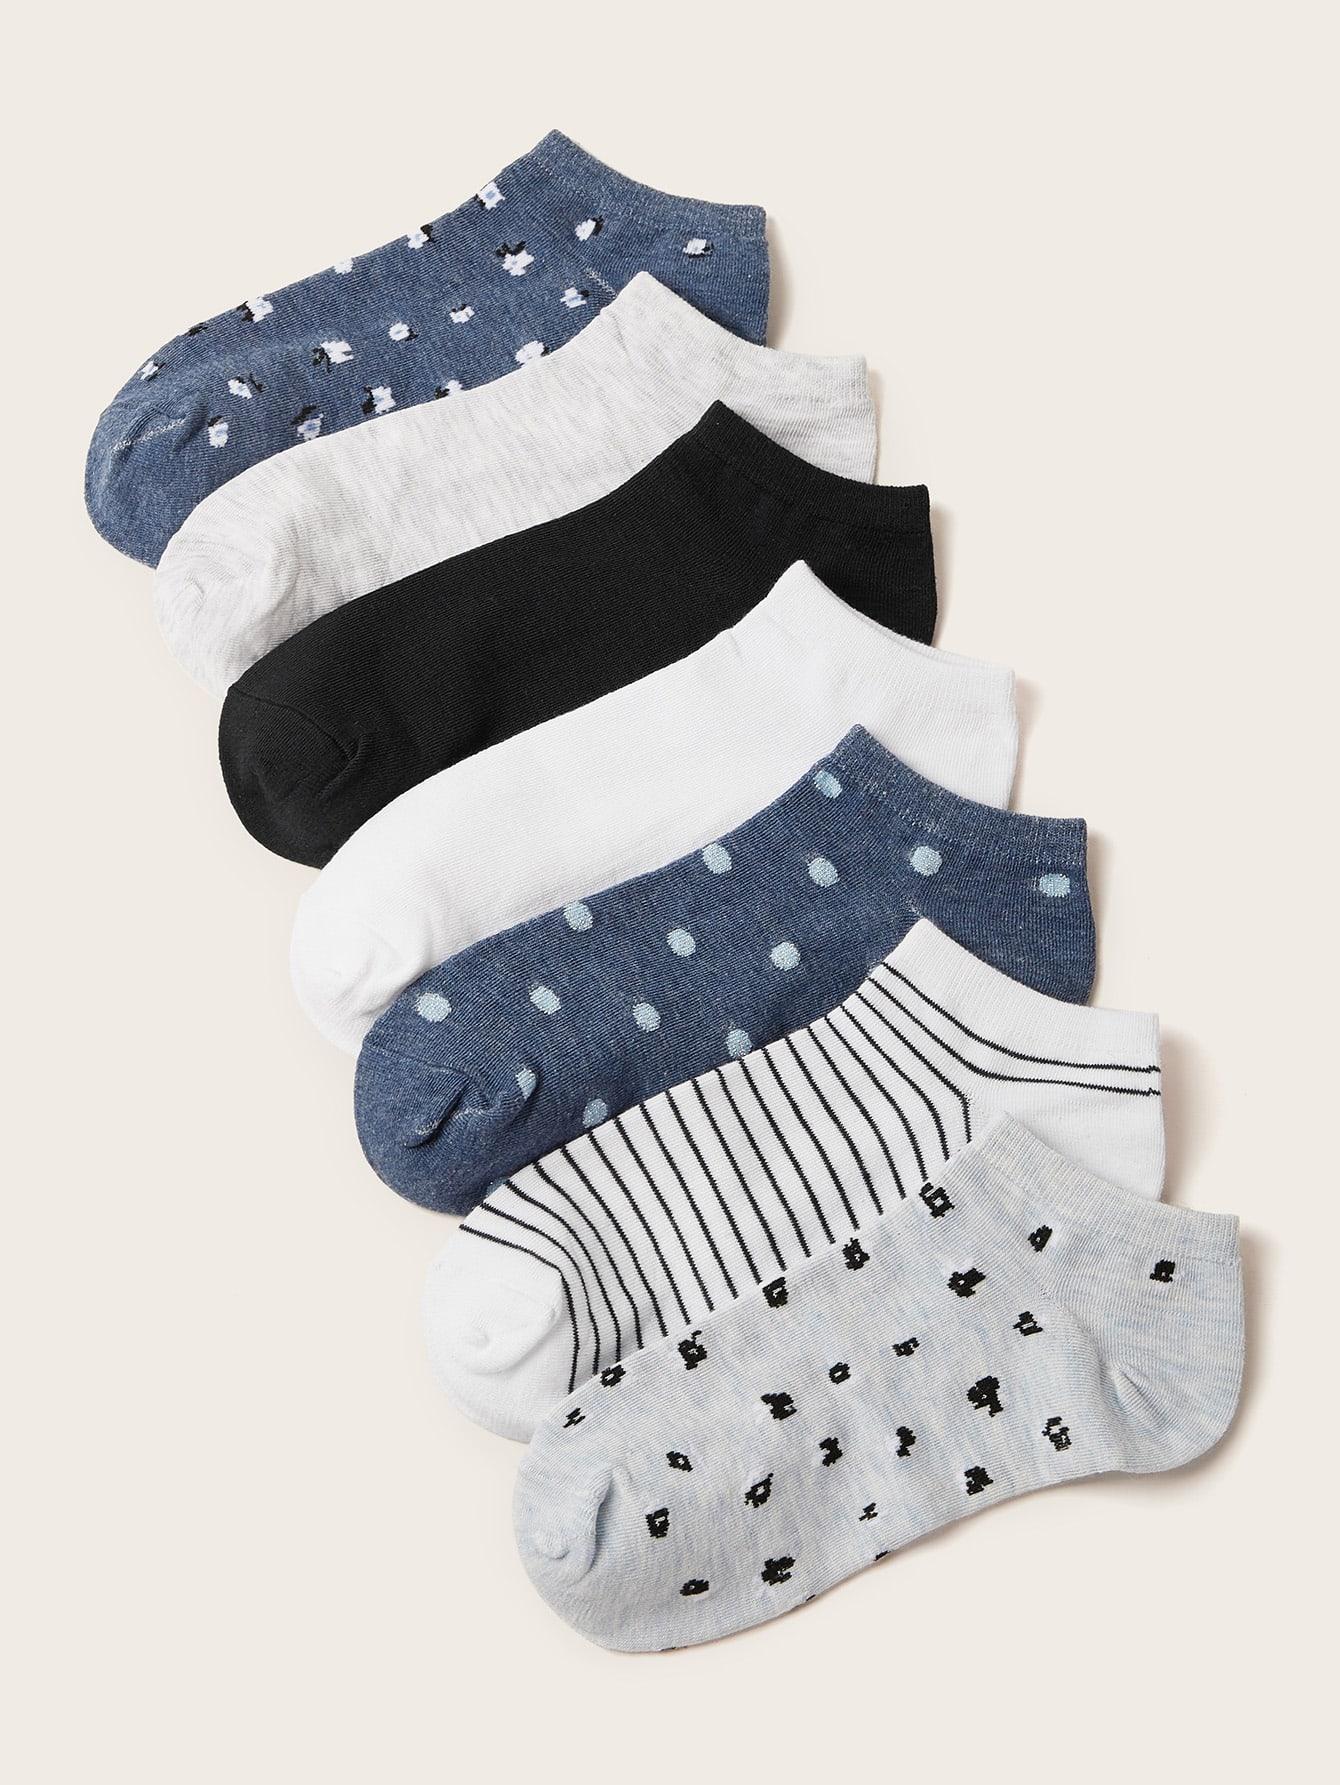 7pairs Striped & Polka Dot Pattern Socks thumbnail